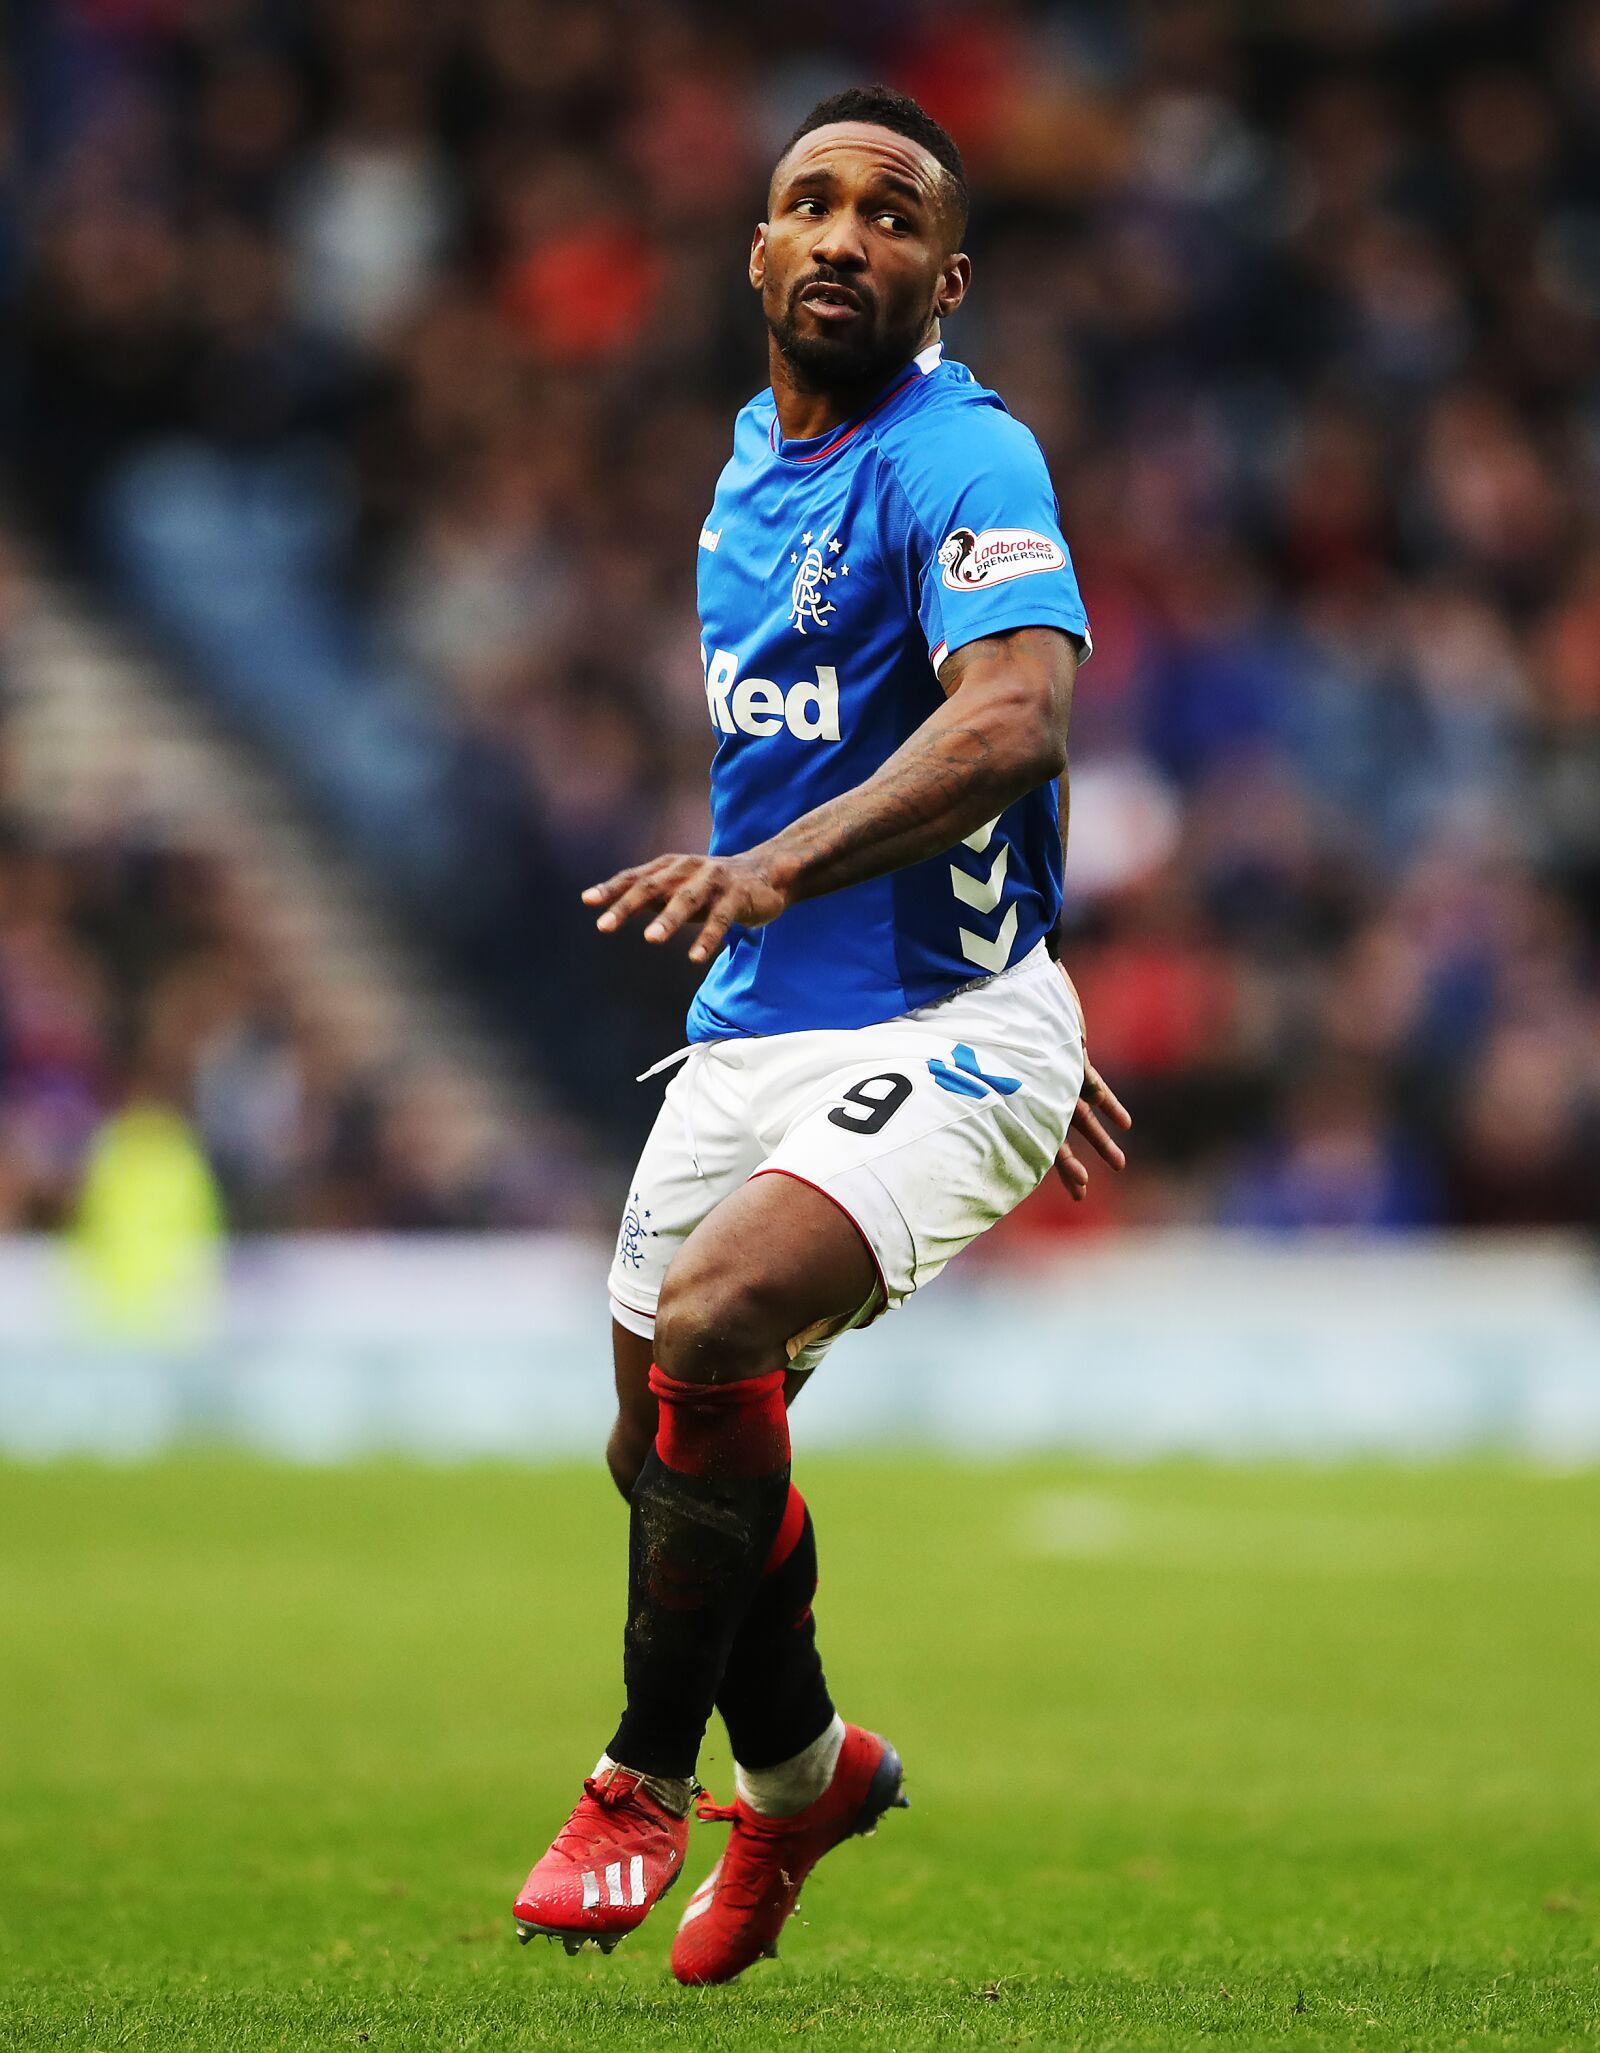 Rangers Score Three of Four Penalties In Route of St Mirren